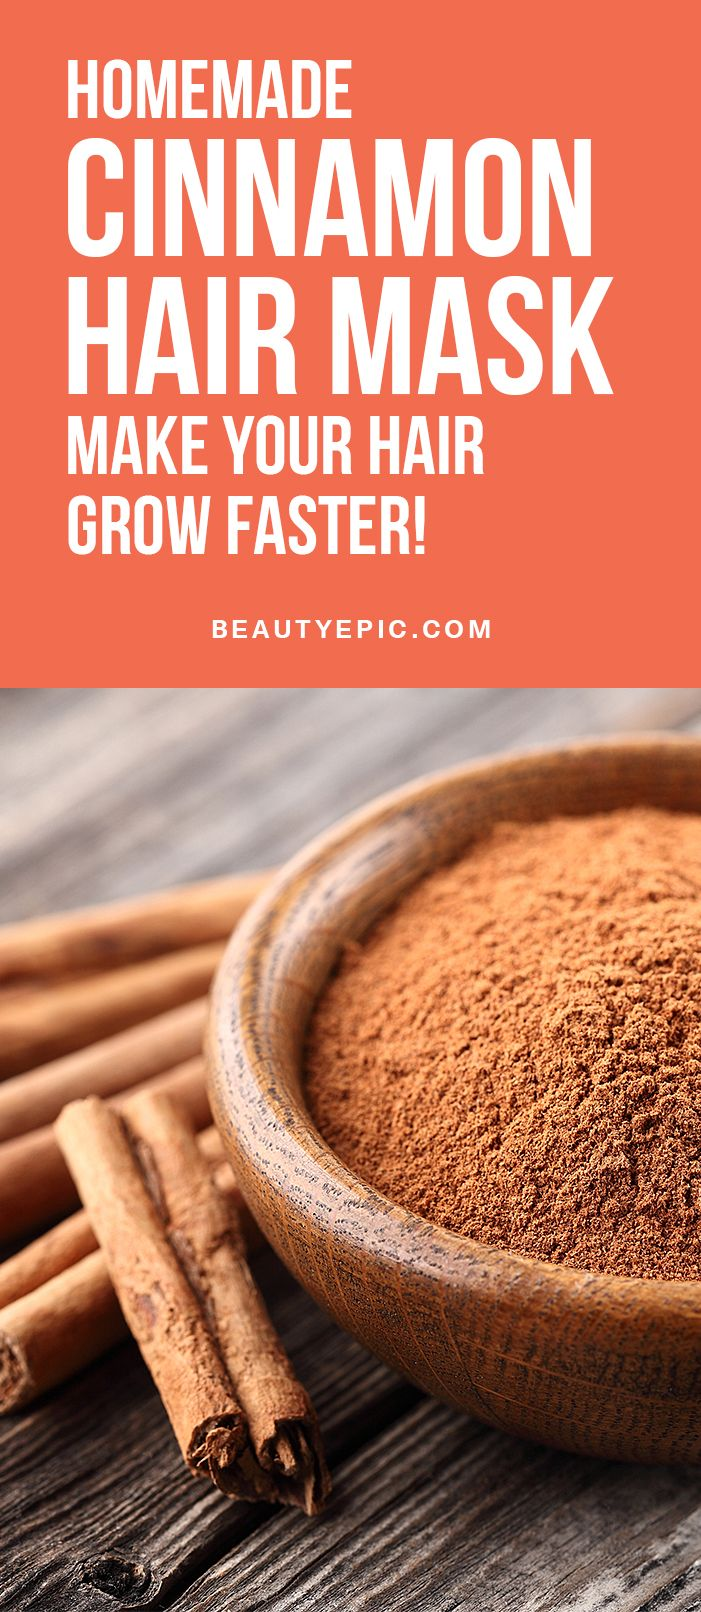 Homemade Cinnamon Hair Mask: Make your Hair Grow Faster!